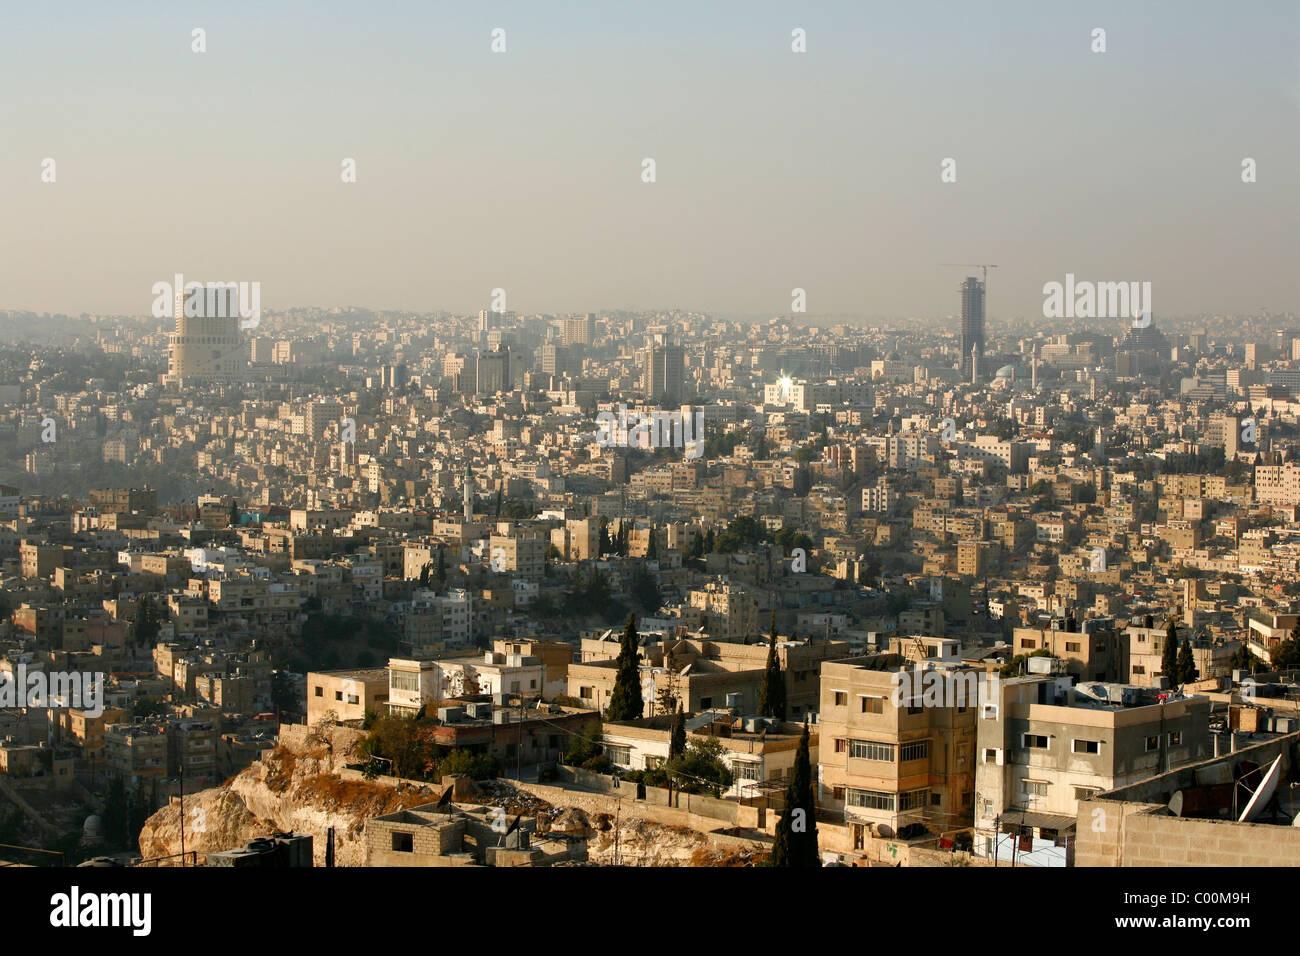 Skyline von Amman, Amman, Jordanien. Stockbild